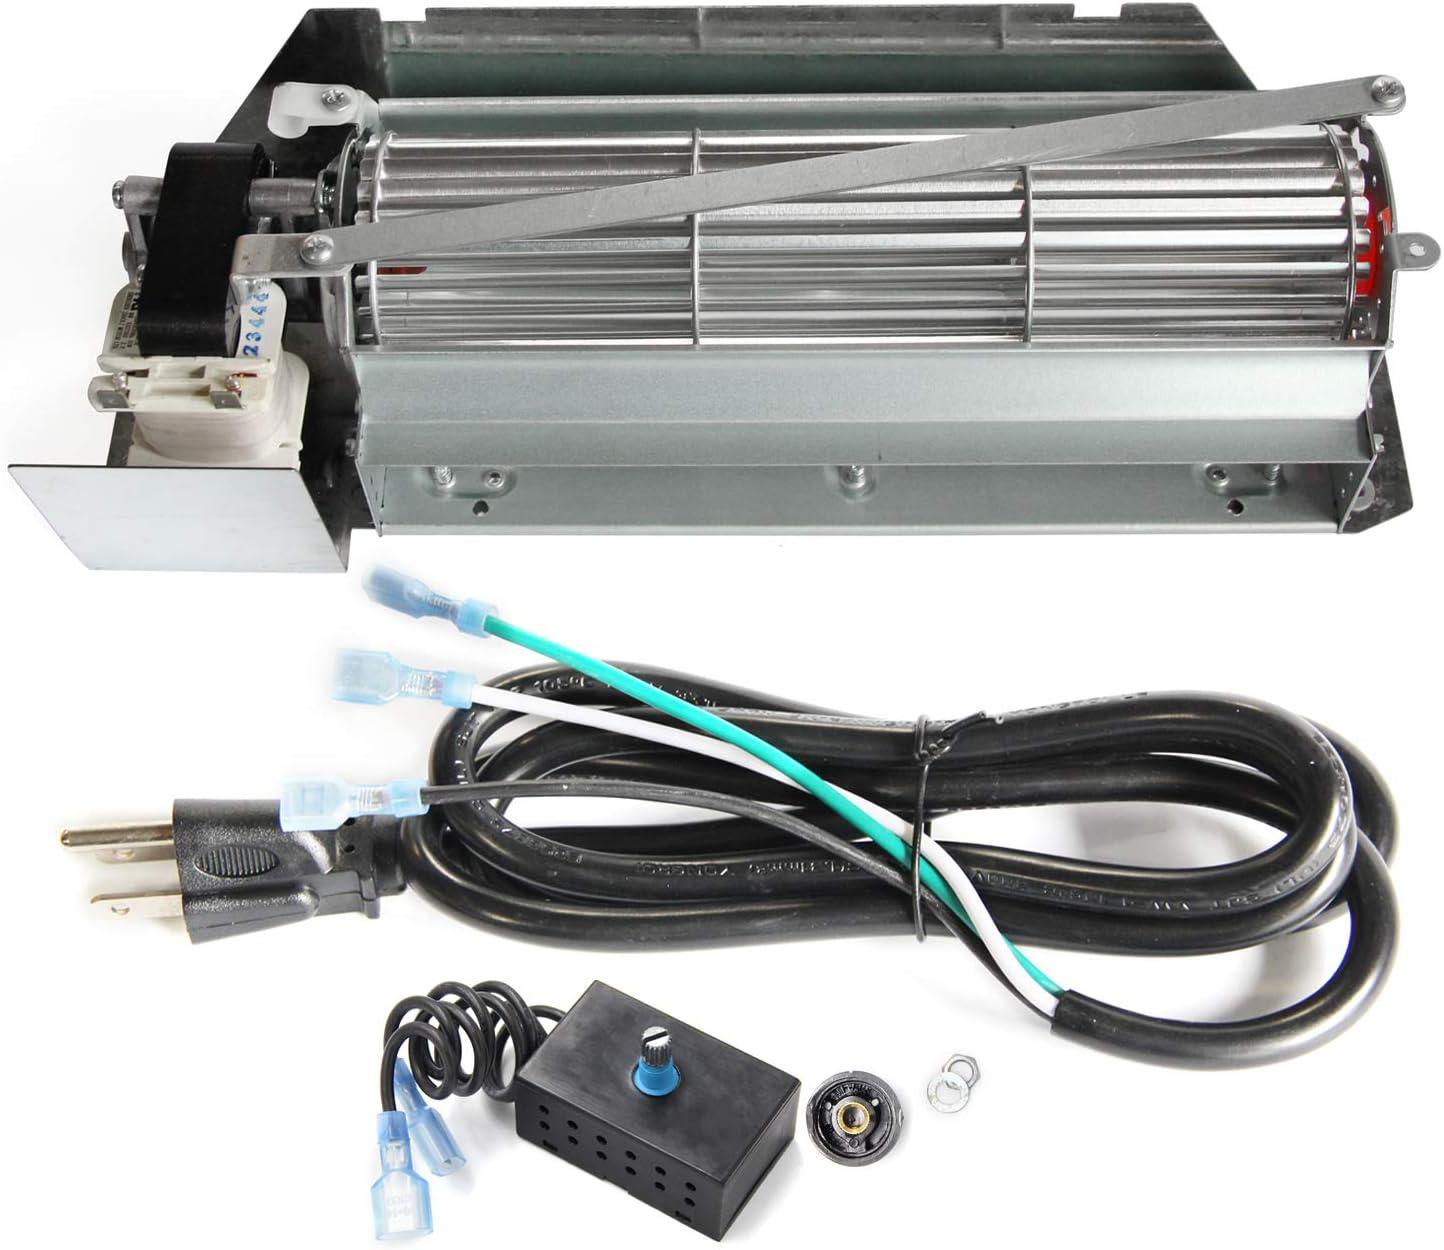 VICOOL FBK-200 Kit de Ventilador de Chimenea de Repuesto para Astria, Lennox, Superior, Rotom: Amazon.es: Hogar